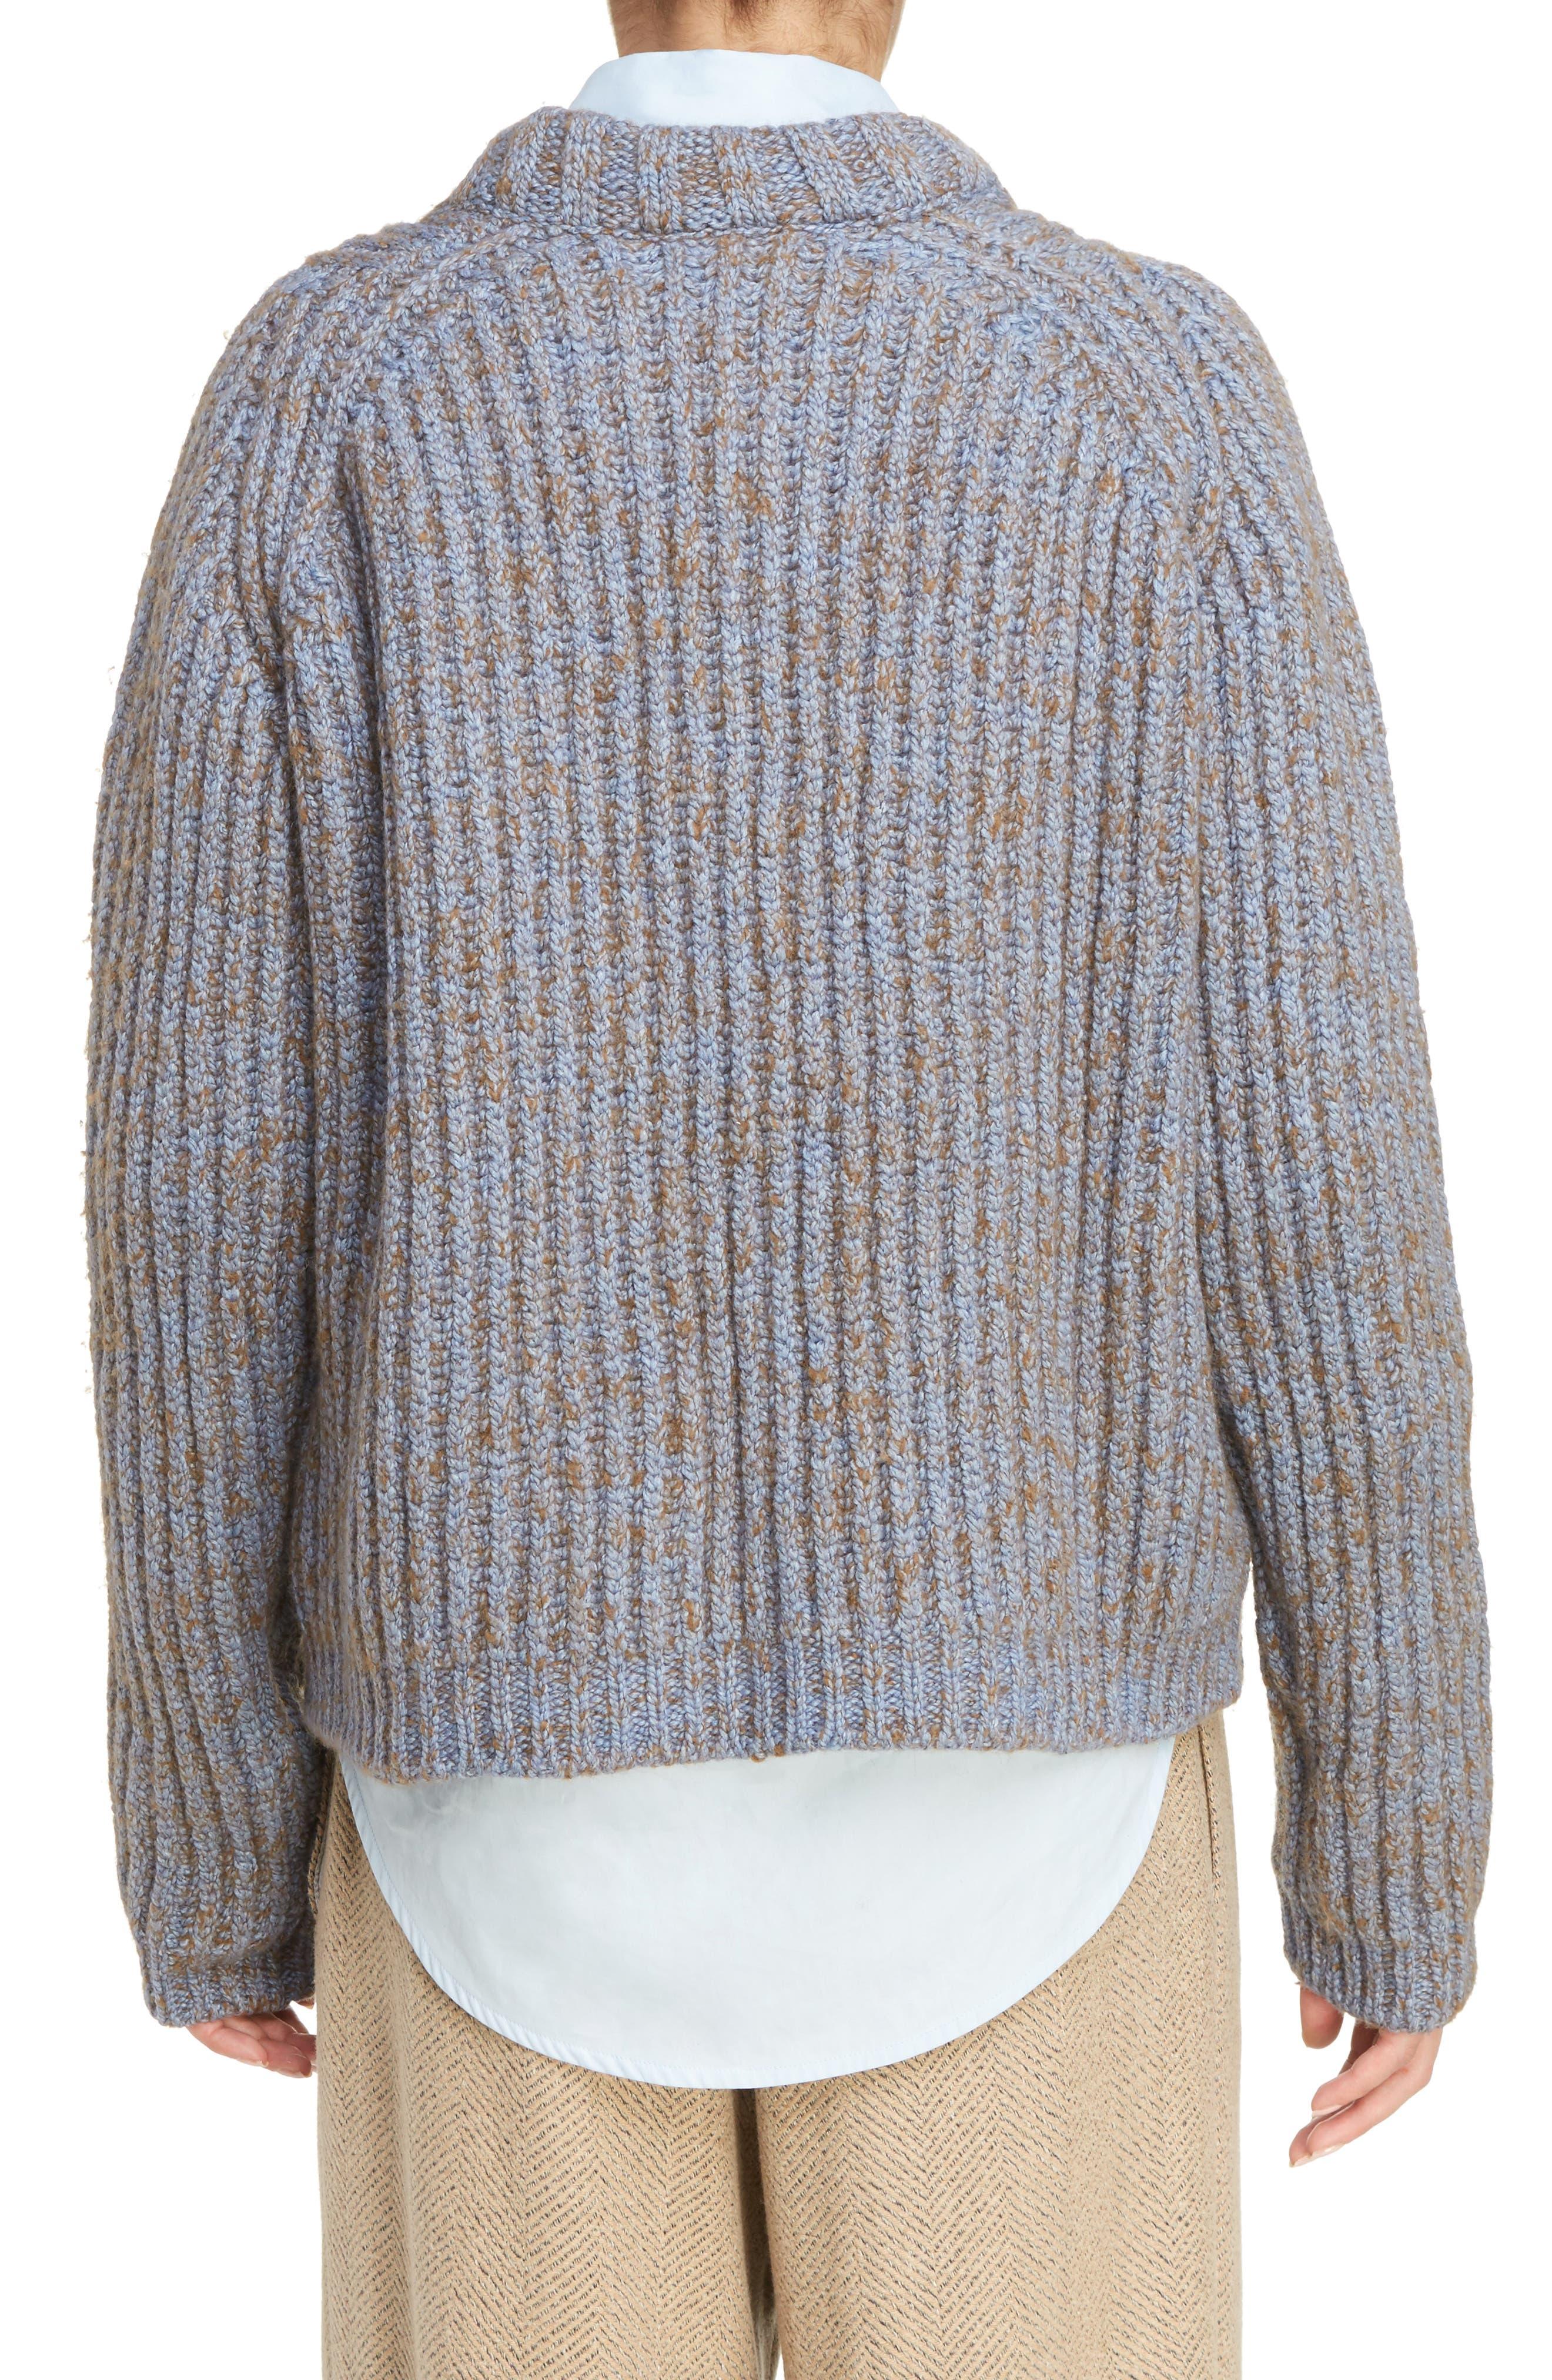 Sandy Mouline Cable Knit Sweater,                             Alternate thumbnail 2, color,                             400